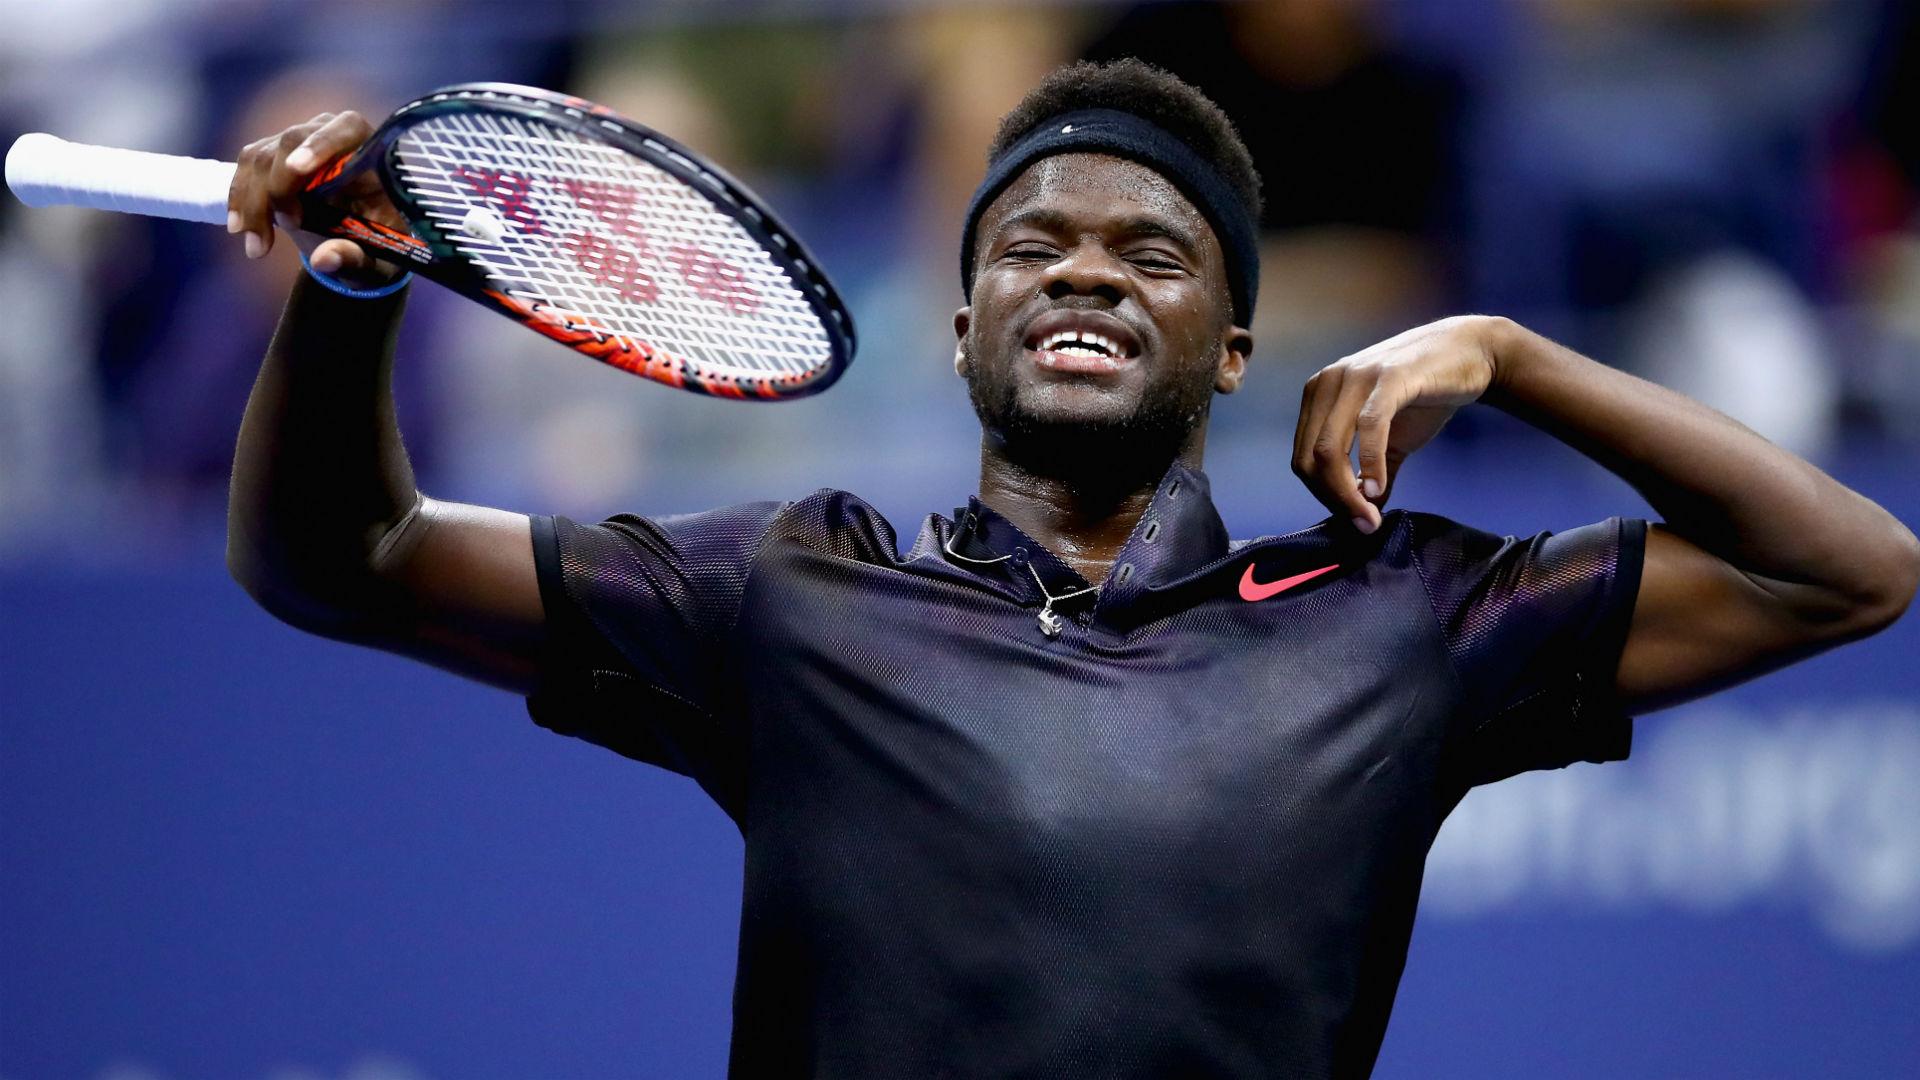 Frances Tiafoe 'proud' of performance against Roger Federer